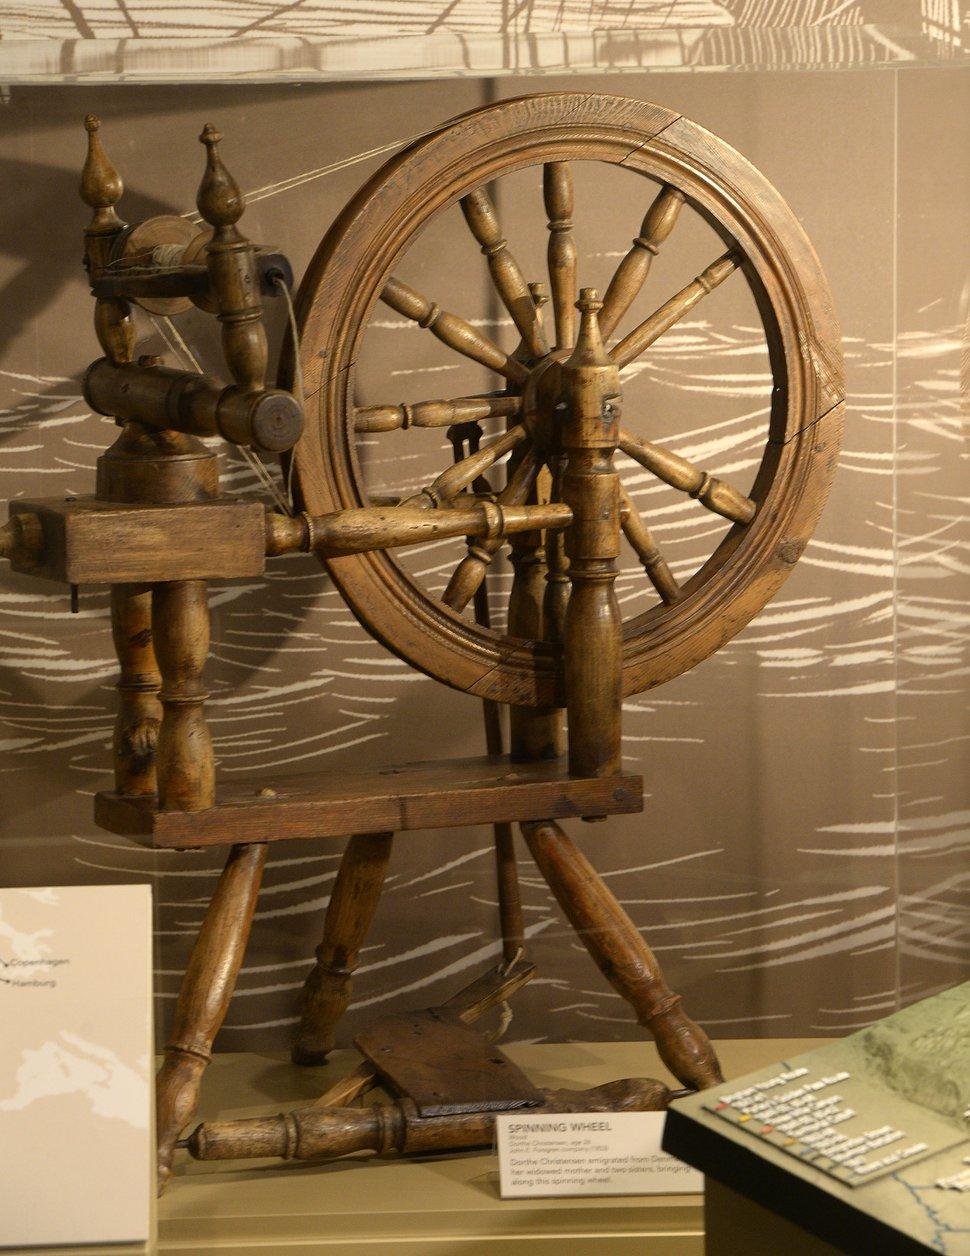 Al Hartmann   The Salt Lake Tribune Spinning wheel of Dorthe Christensen, brought from Denmark to Utah in 1853. It's one of many historical items in